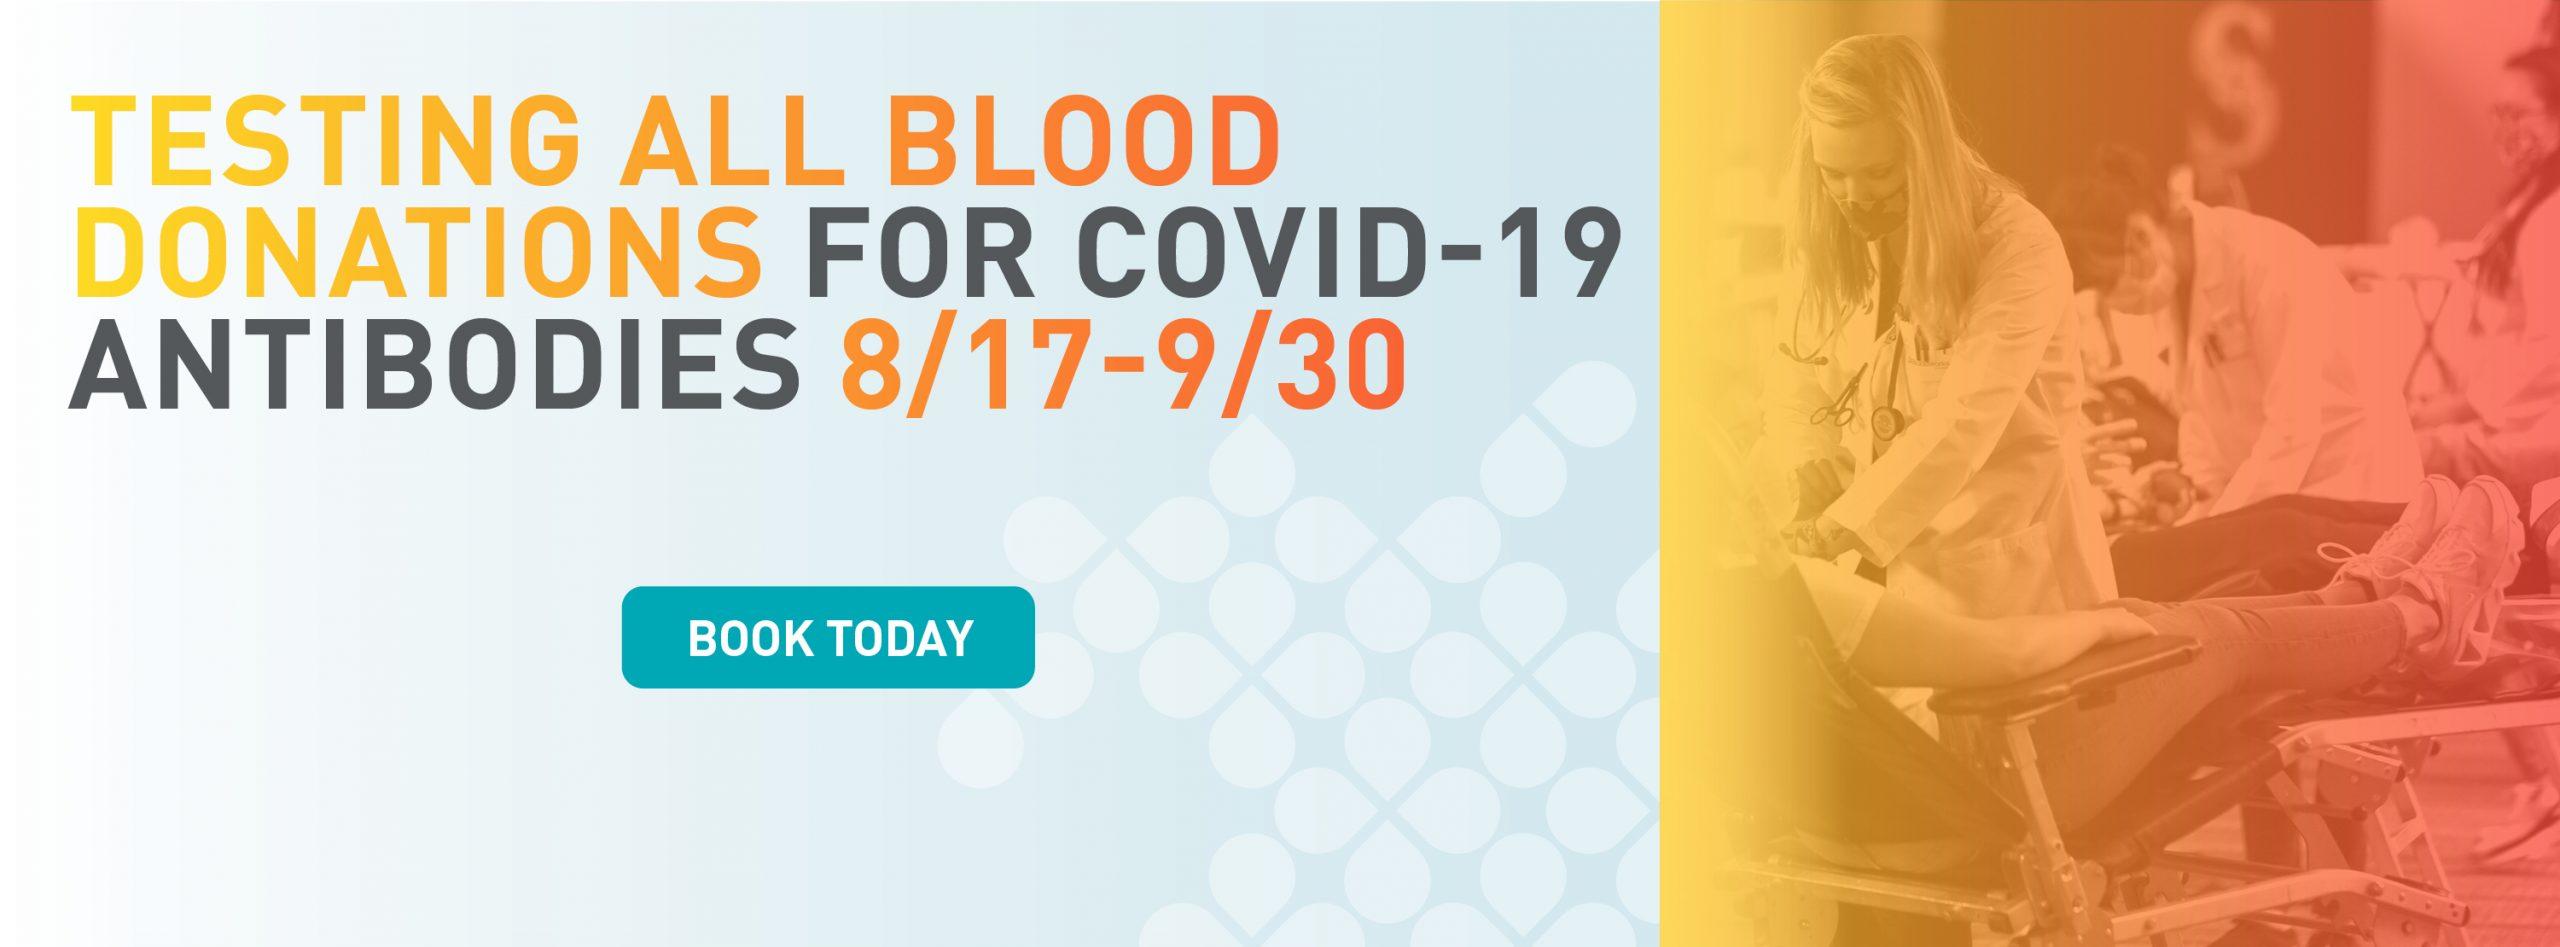 Antibody Testing Covid-19